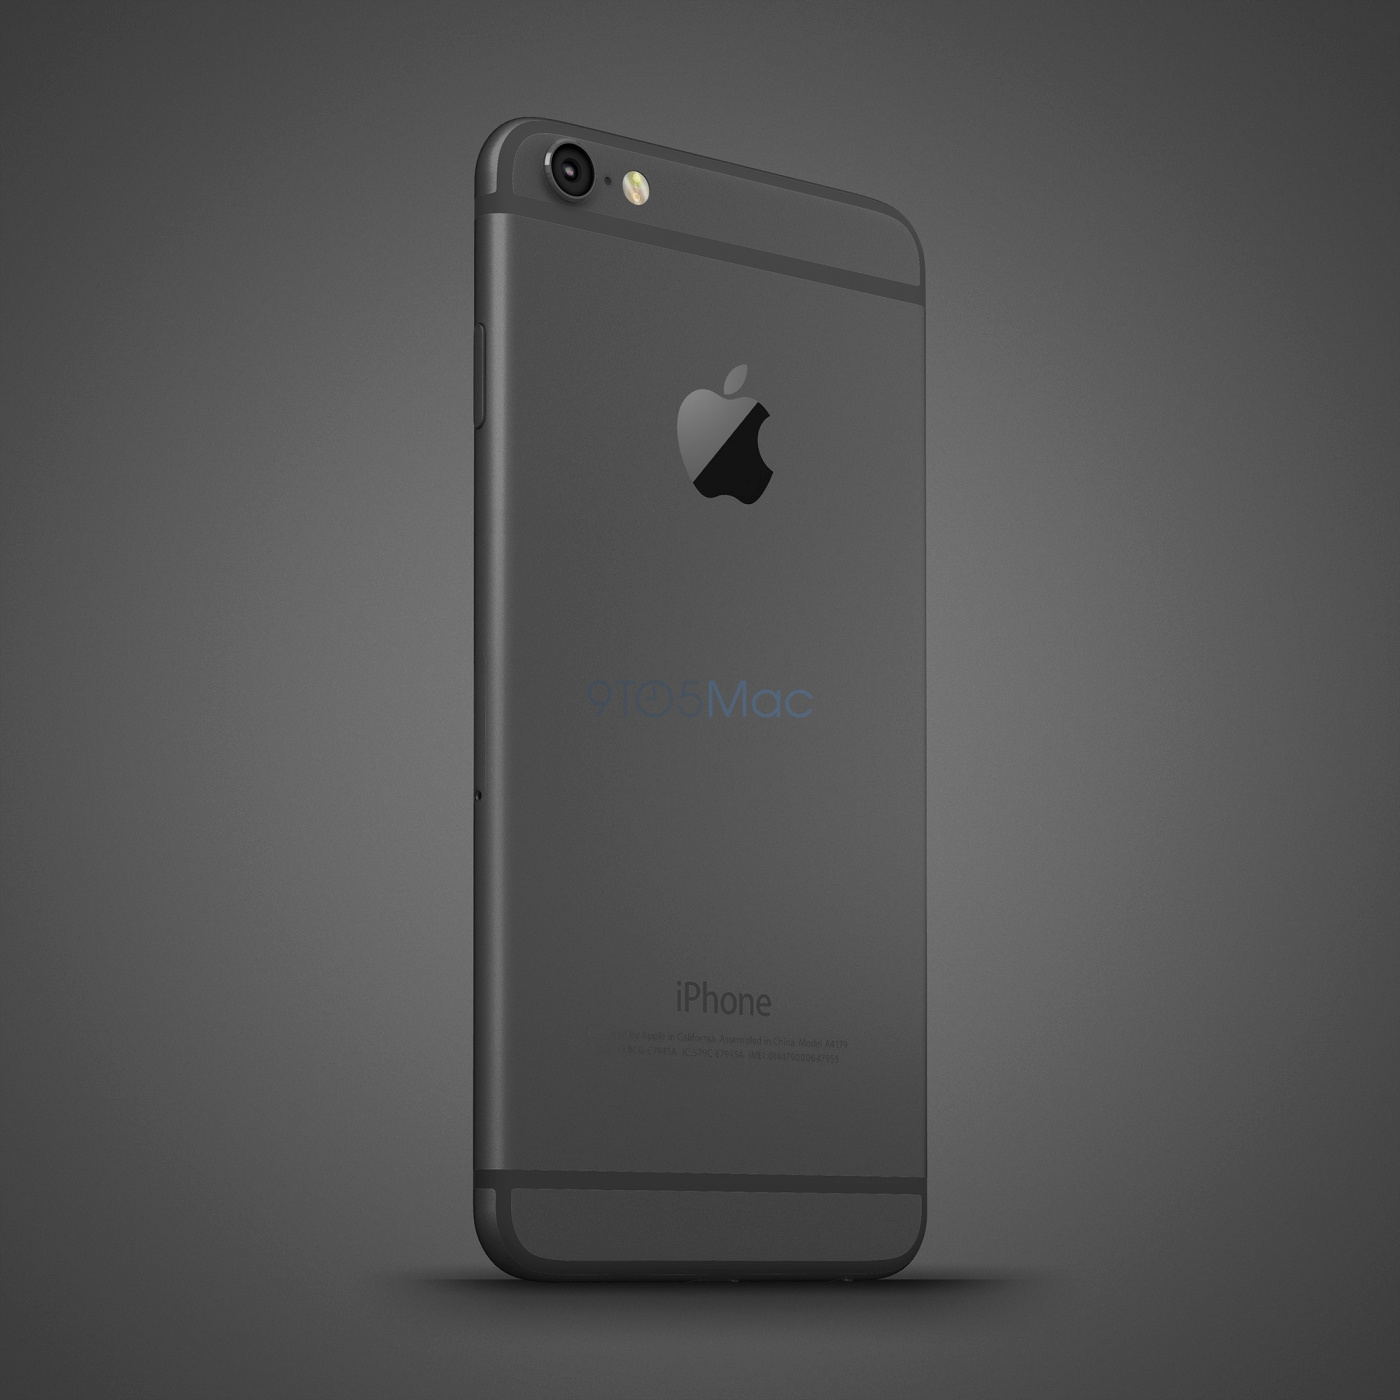 iphone-6c-spacegrey_rear